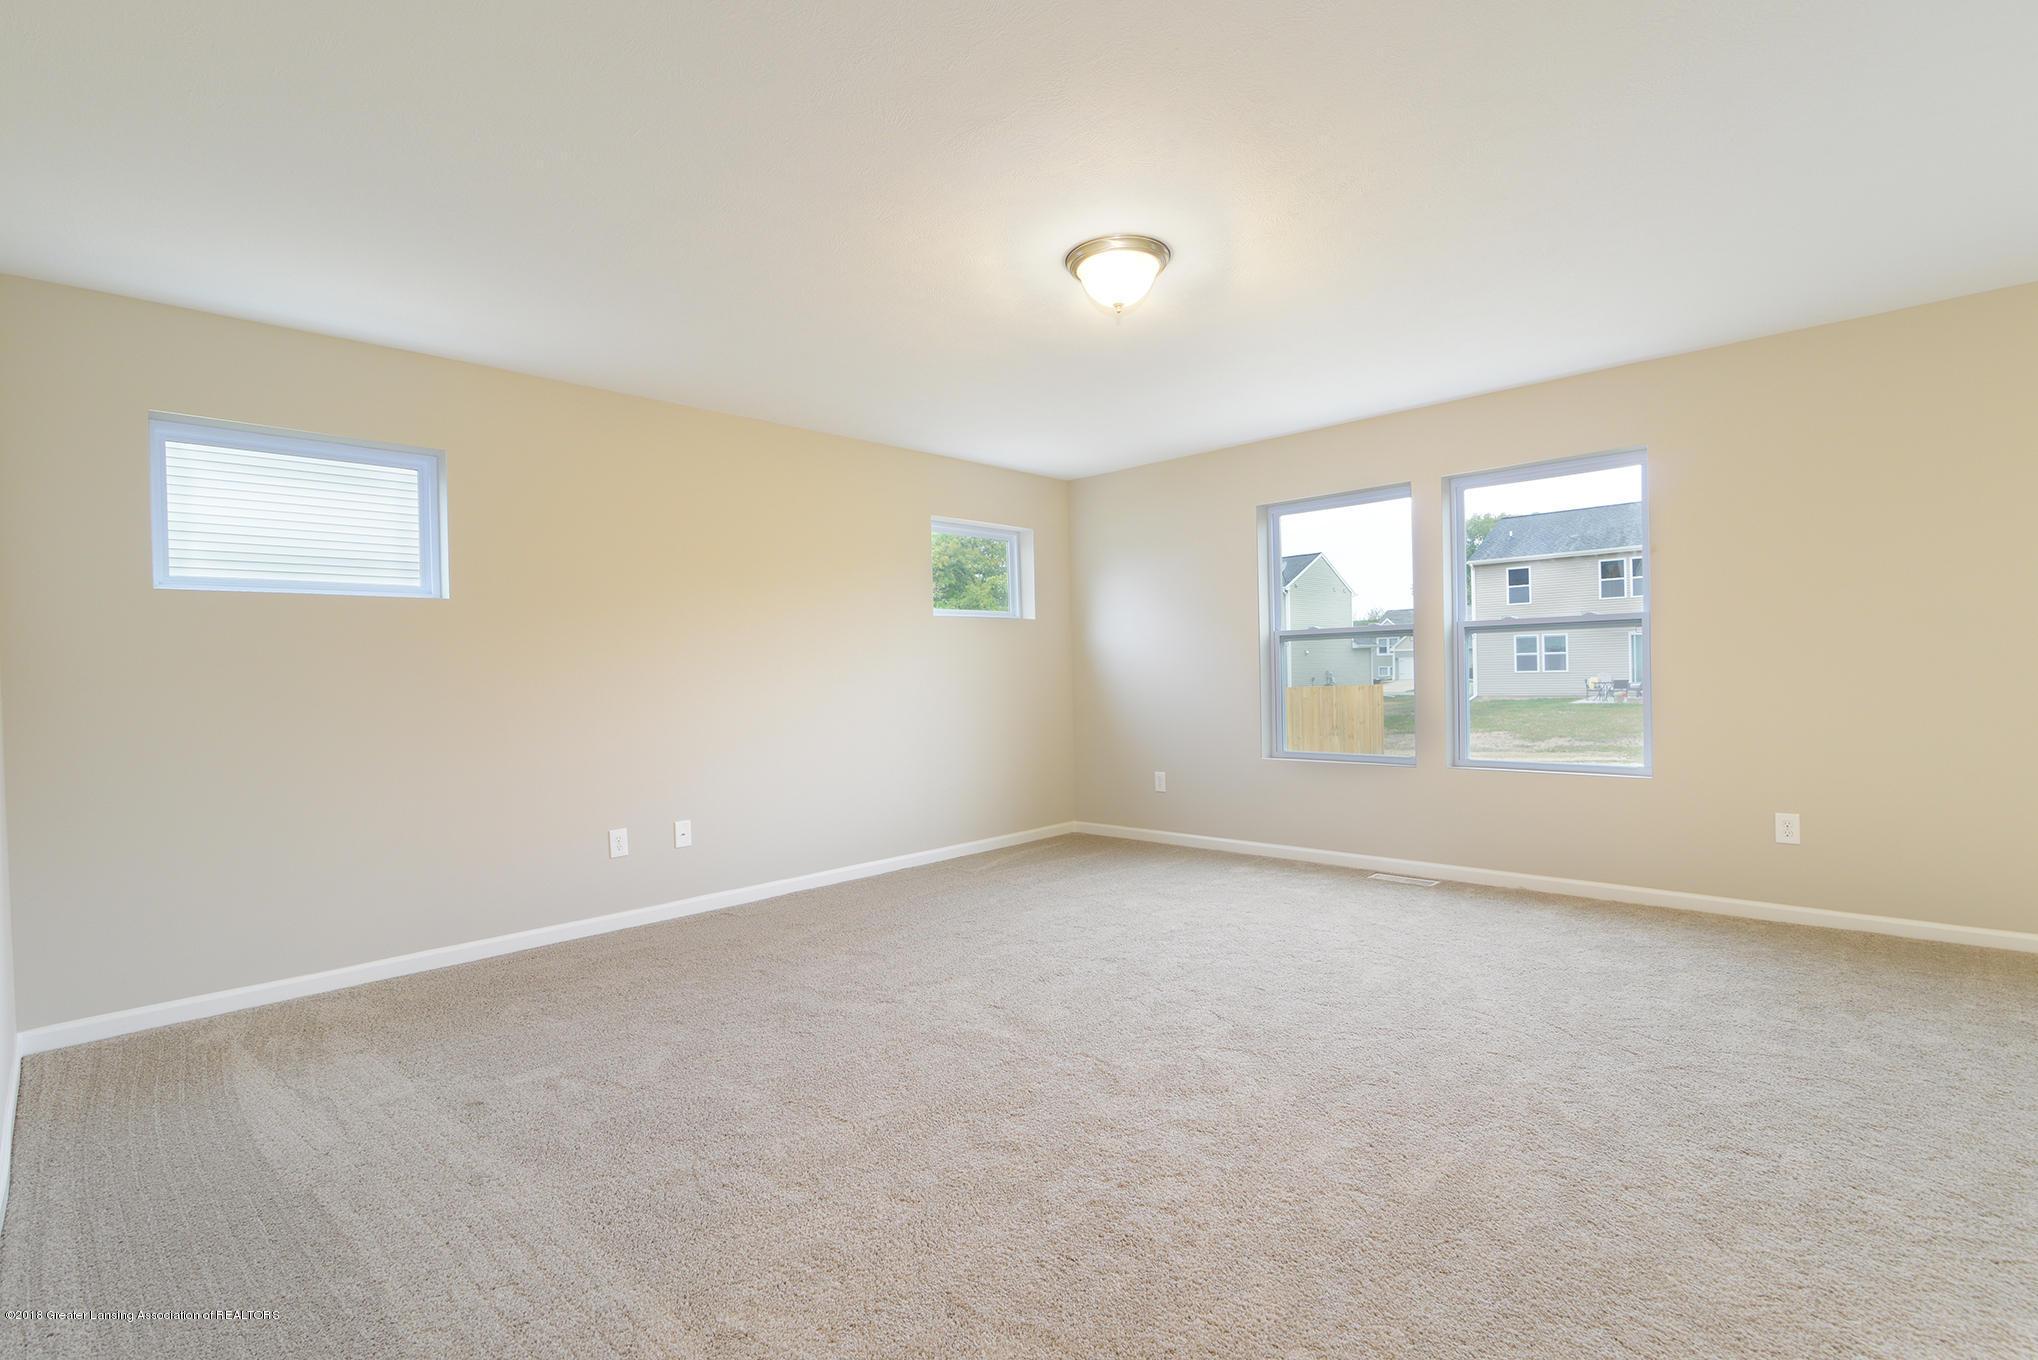 3586 Fernwood Ln - GDN111-E1700 Great Room-1 - 3